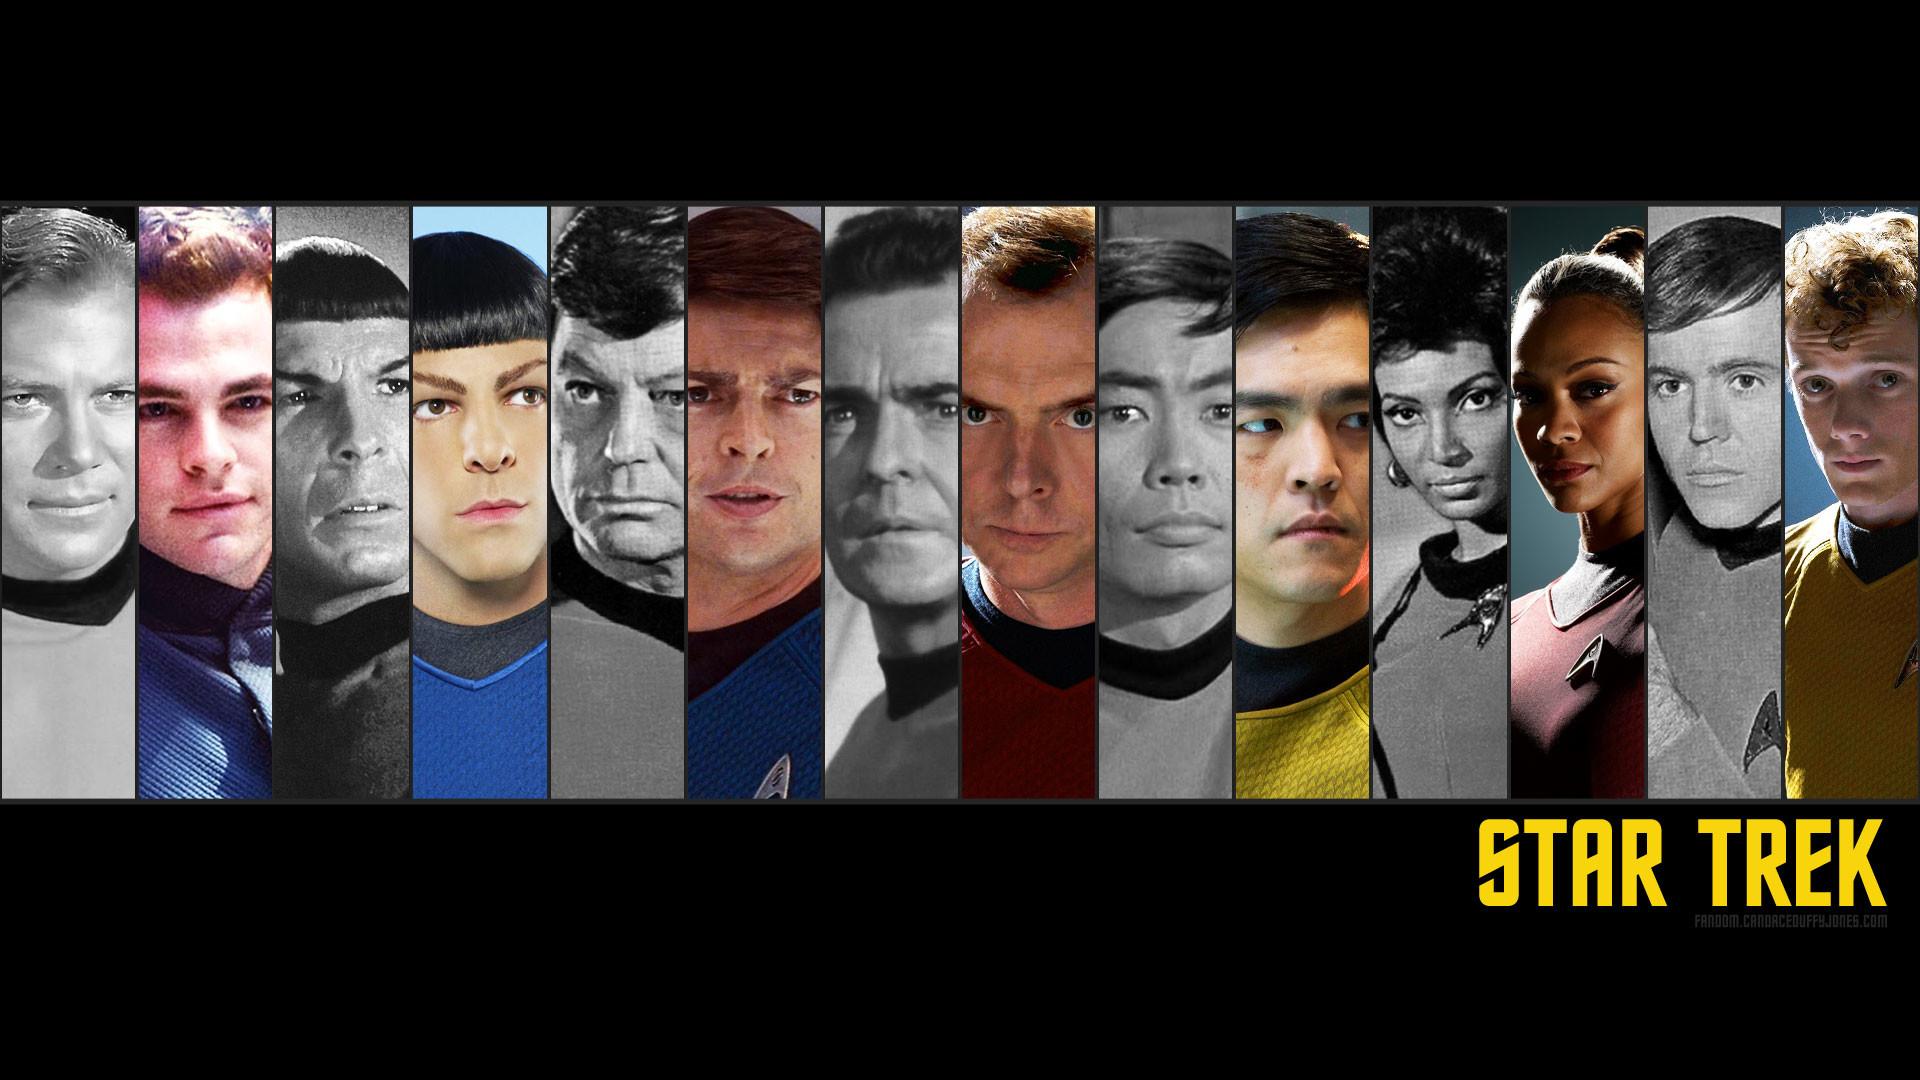 1920x1080 Star Trek 2009 Movie Wallpaper